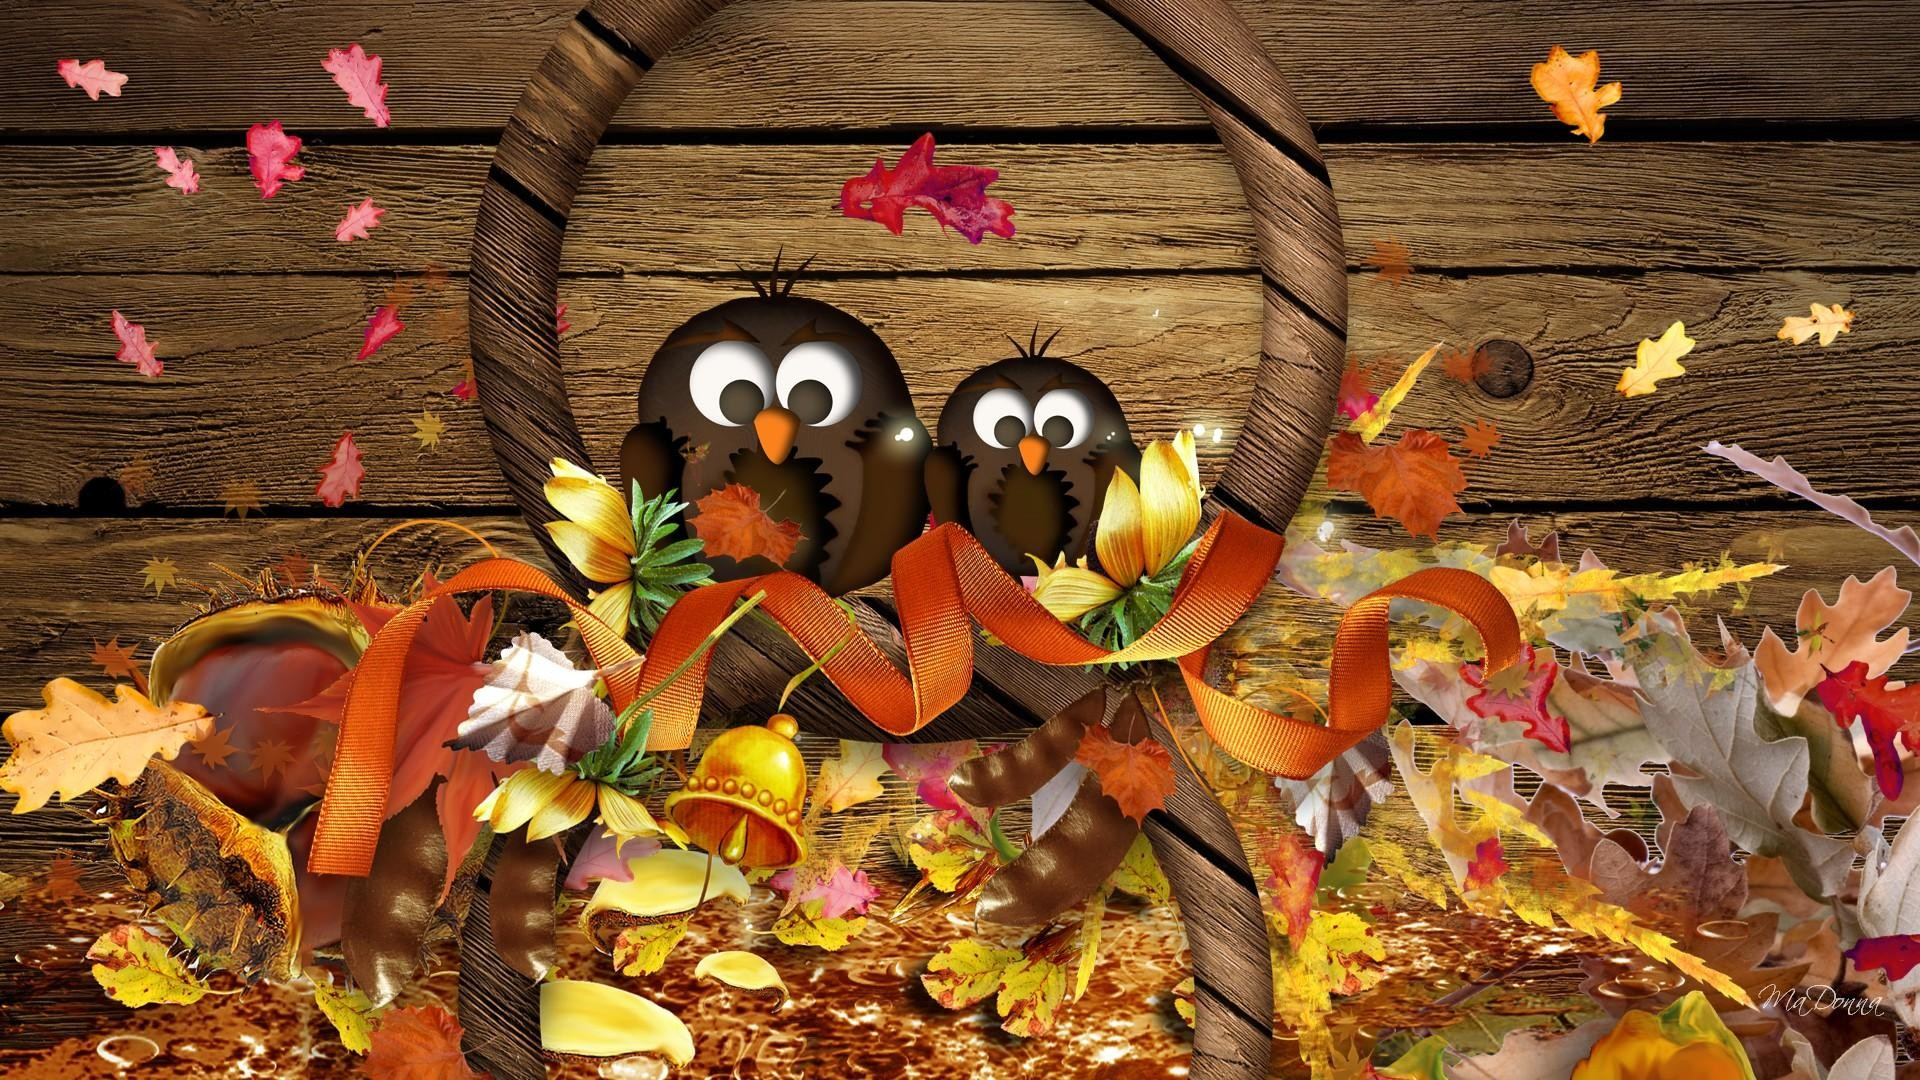 Cute Thanksgiving Screensavers | Thanksgiving HD Desktop Wallpapers for…  Fall WallpaperHoliday WallpaperWallpaper BackgroundsFree …